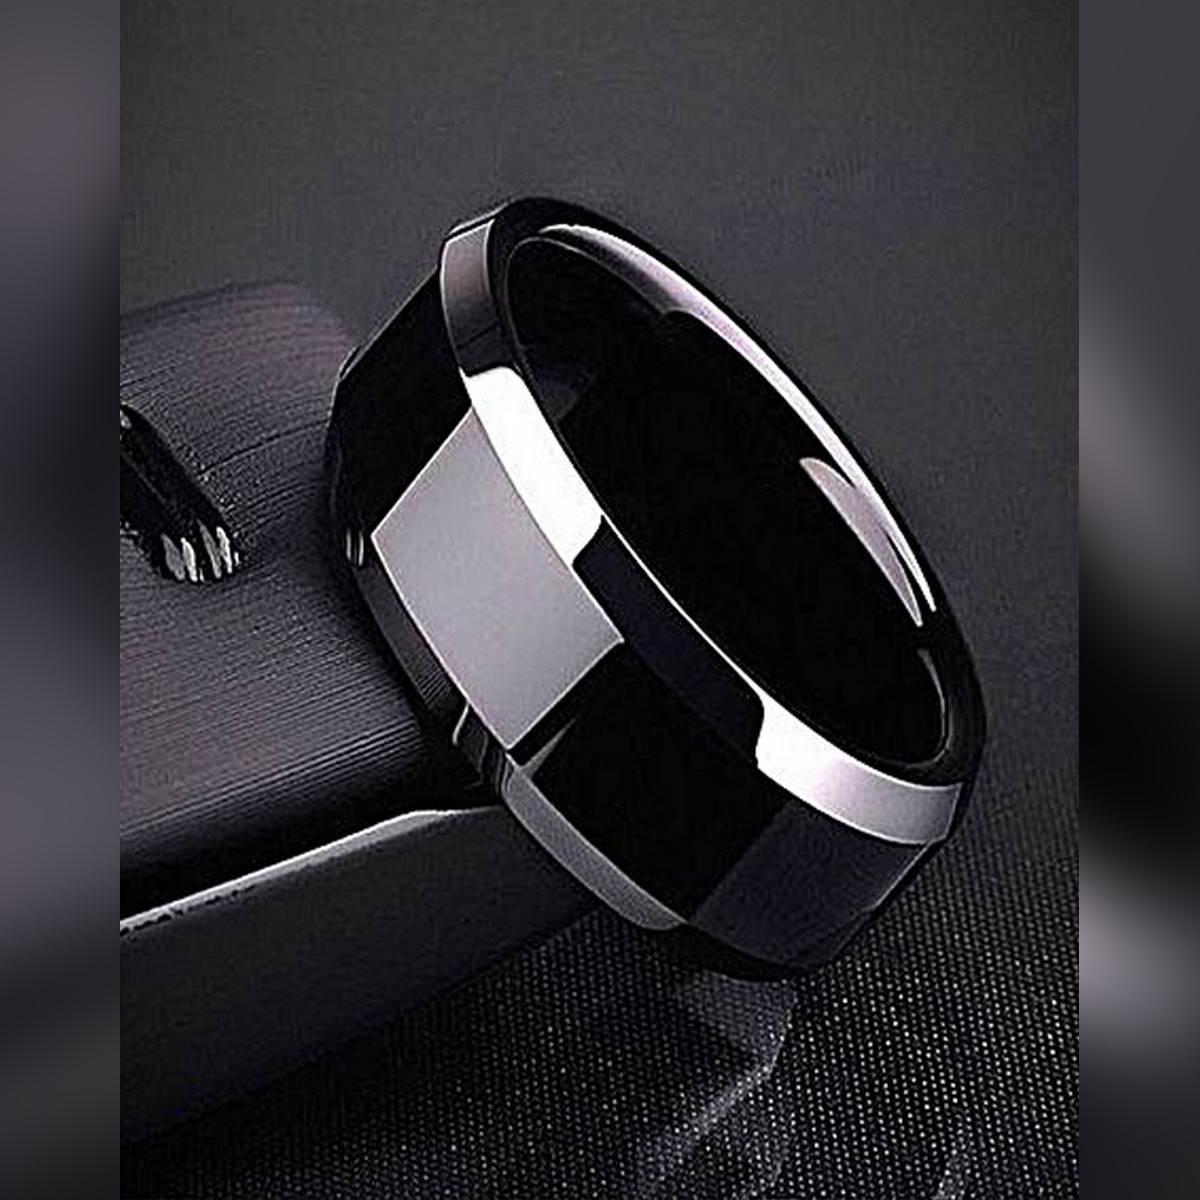 Black Titanium Ring for Men - Square Black Ring For Boys - Casual Black Polished Biker Ring